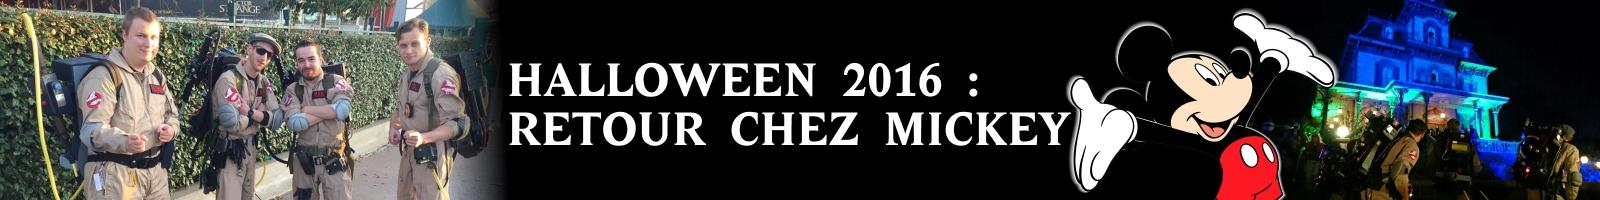 http://www.ghostbusters-france.net/halloween-2016-retour-chez-mickey/